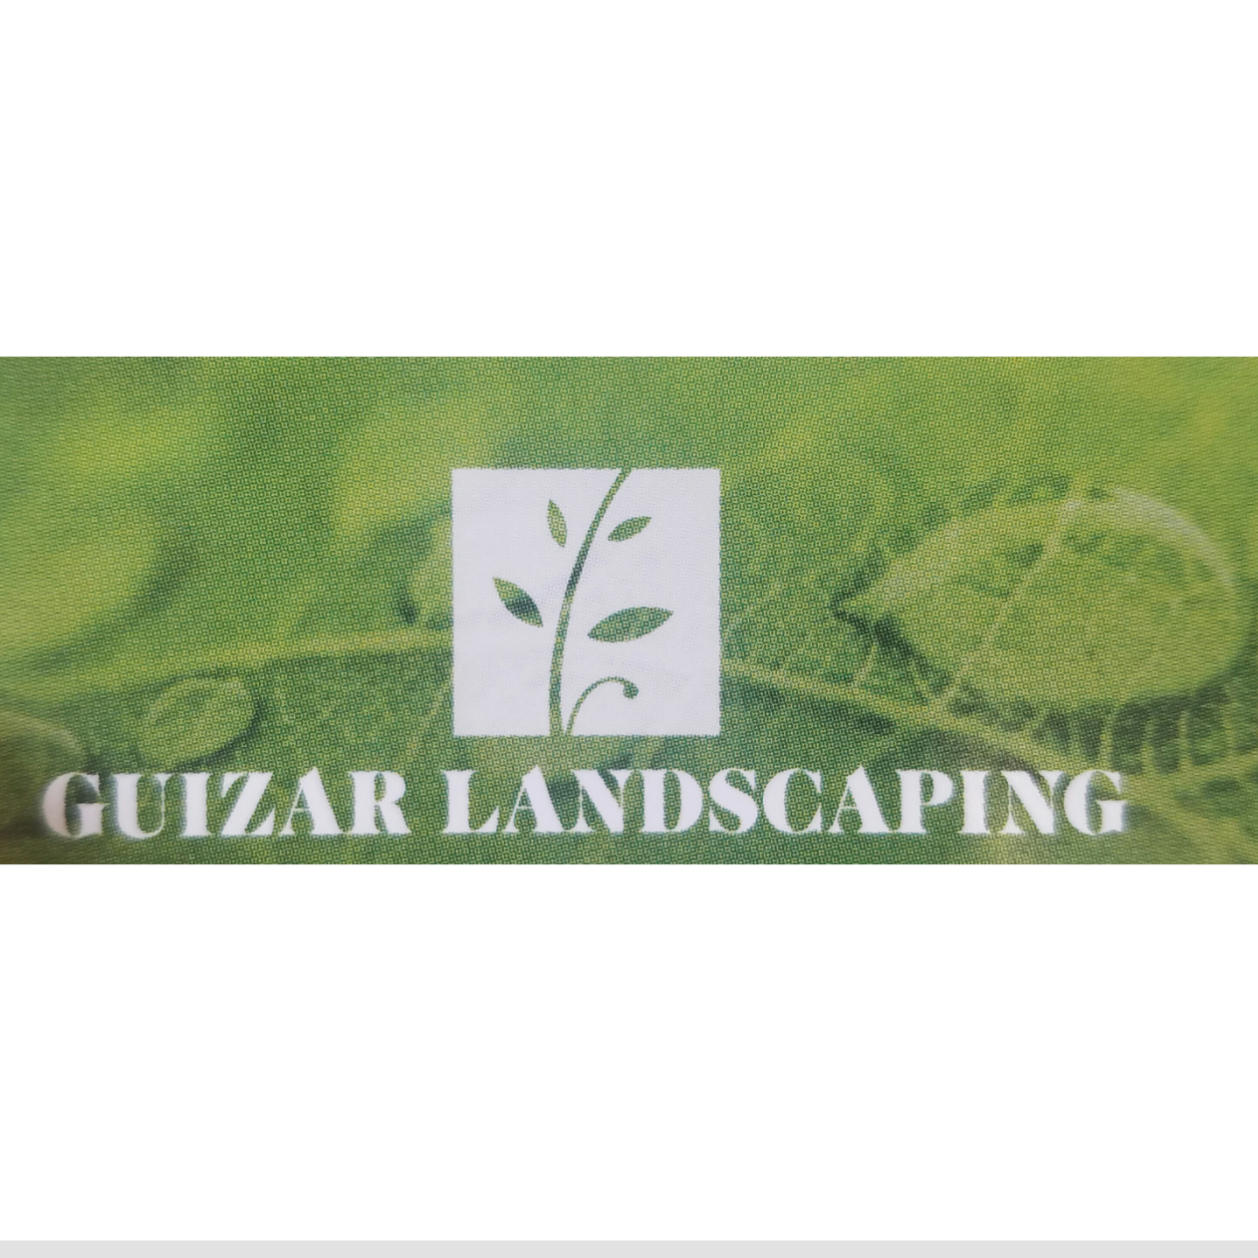 Guizar Landscaping